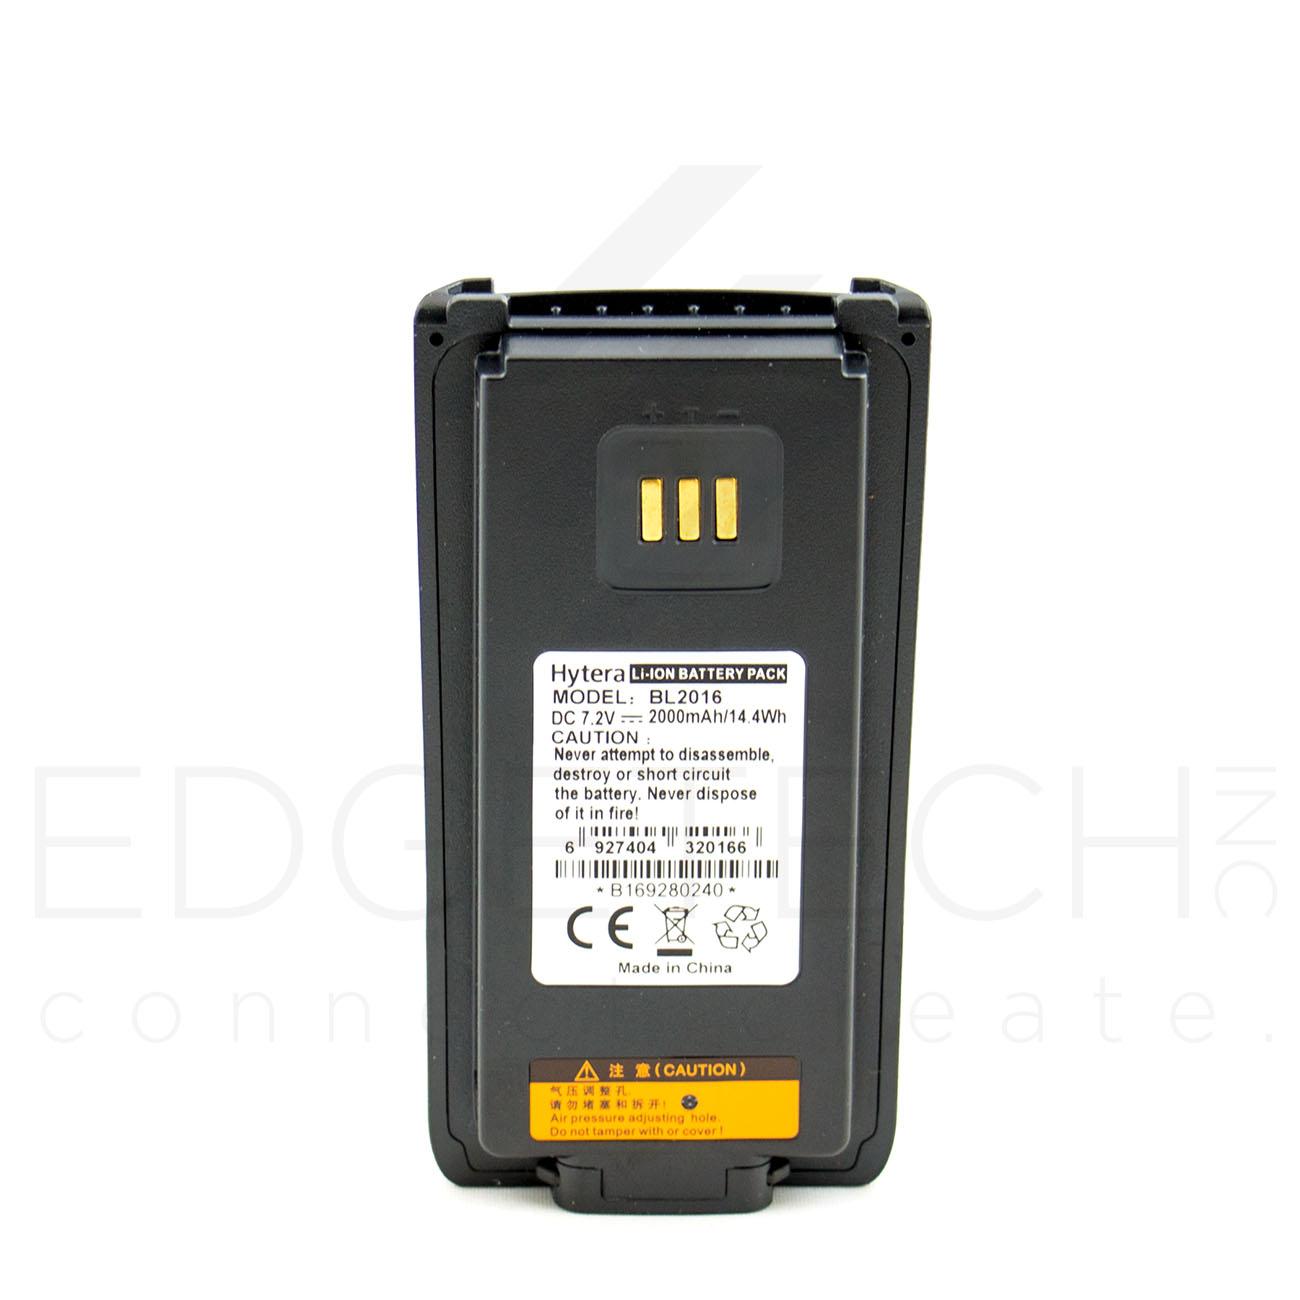 Hytera PD982iG-U5 DMR PORTABLE GPS UHF